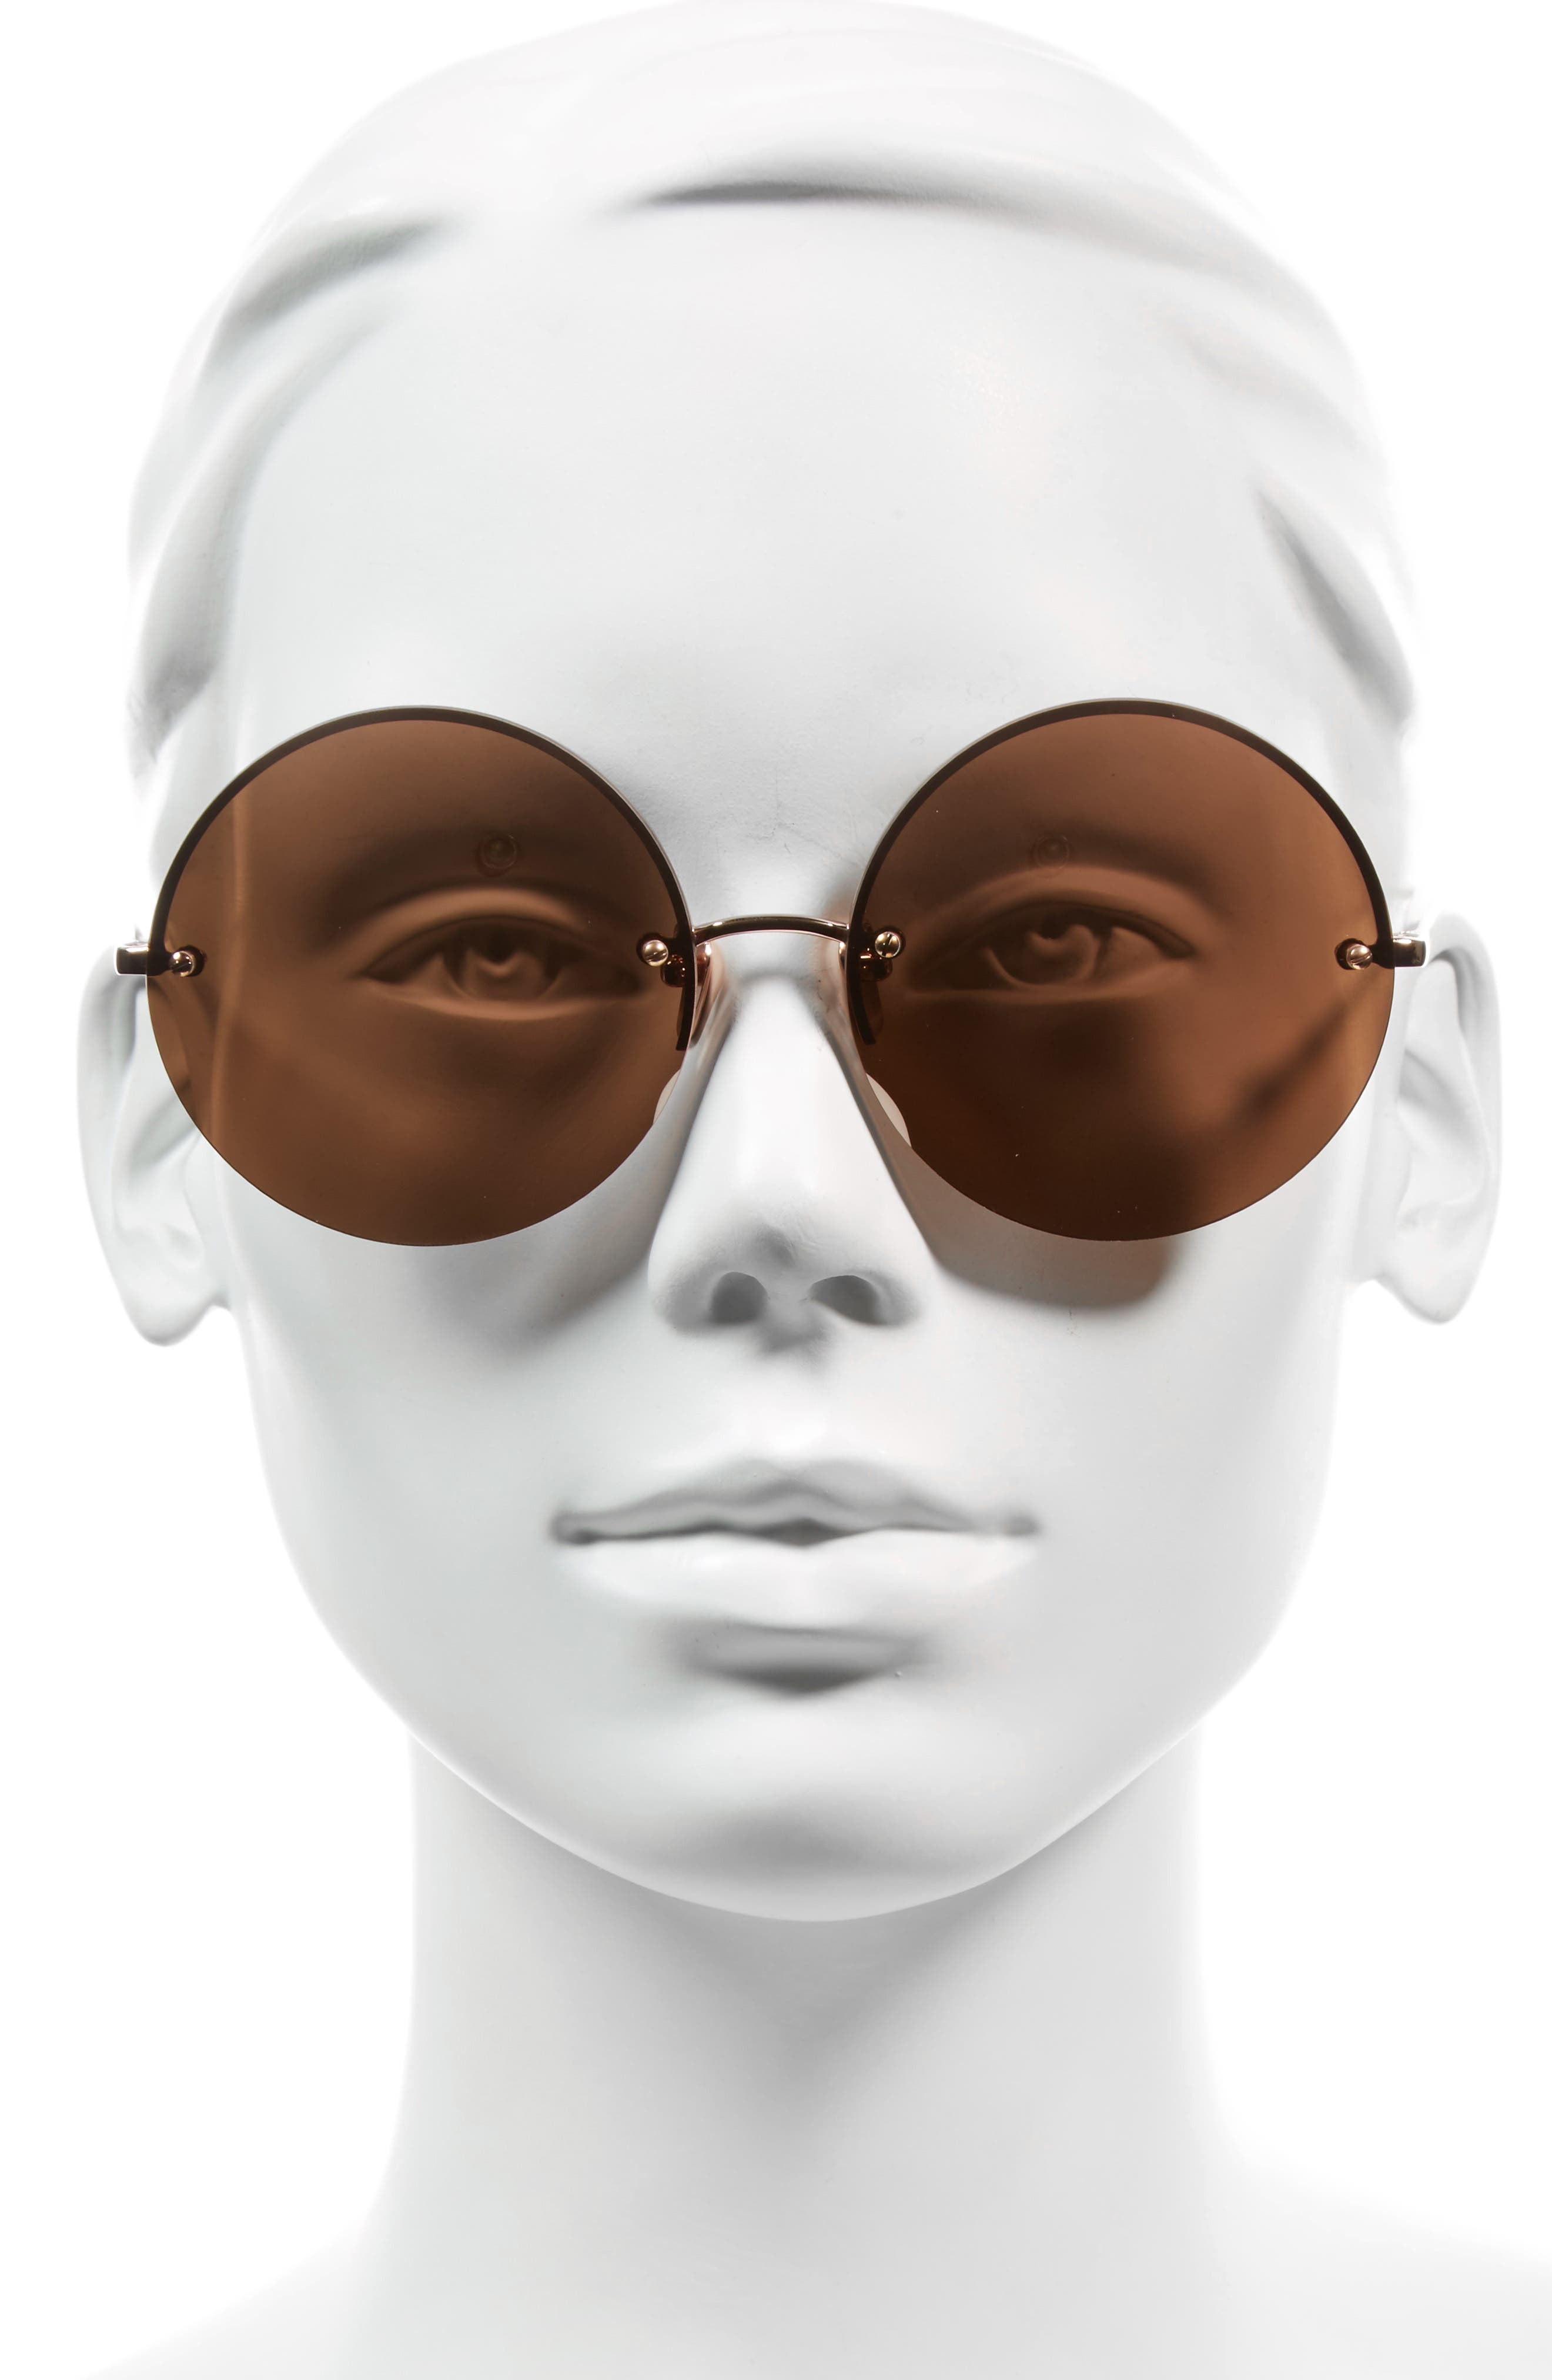 58mm 22 Karat Gold Trim Rimless Round Sunglasses,                             Alternate thumbnail 4, color,